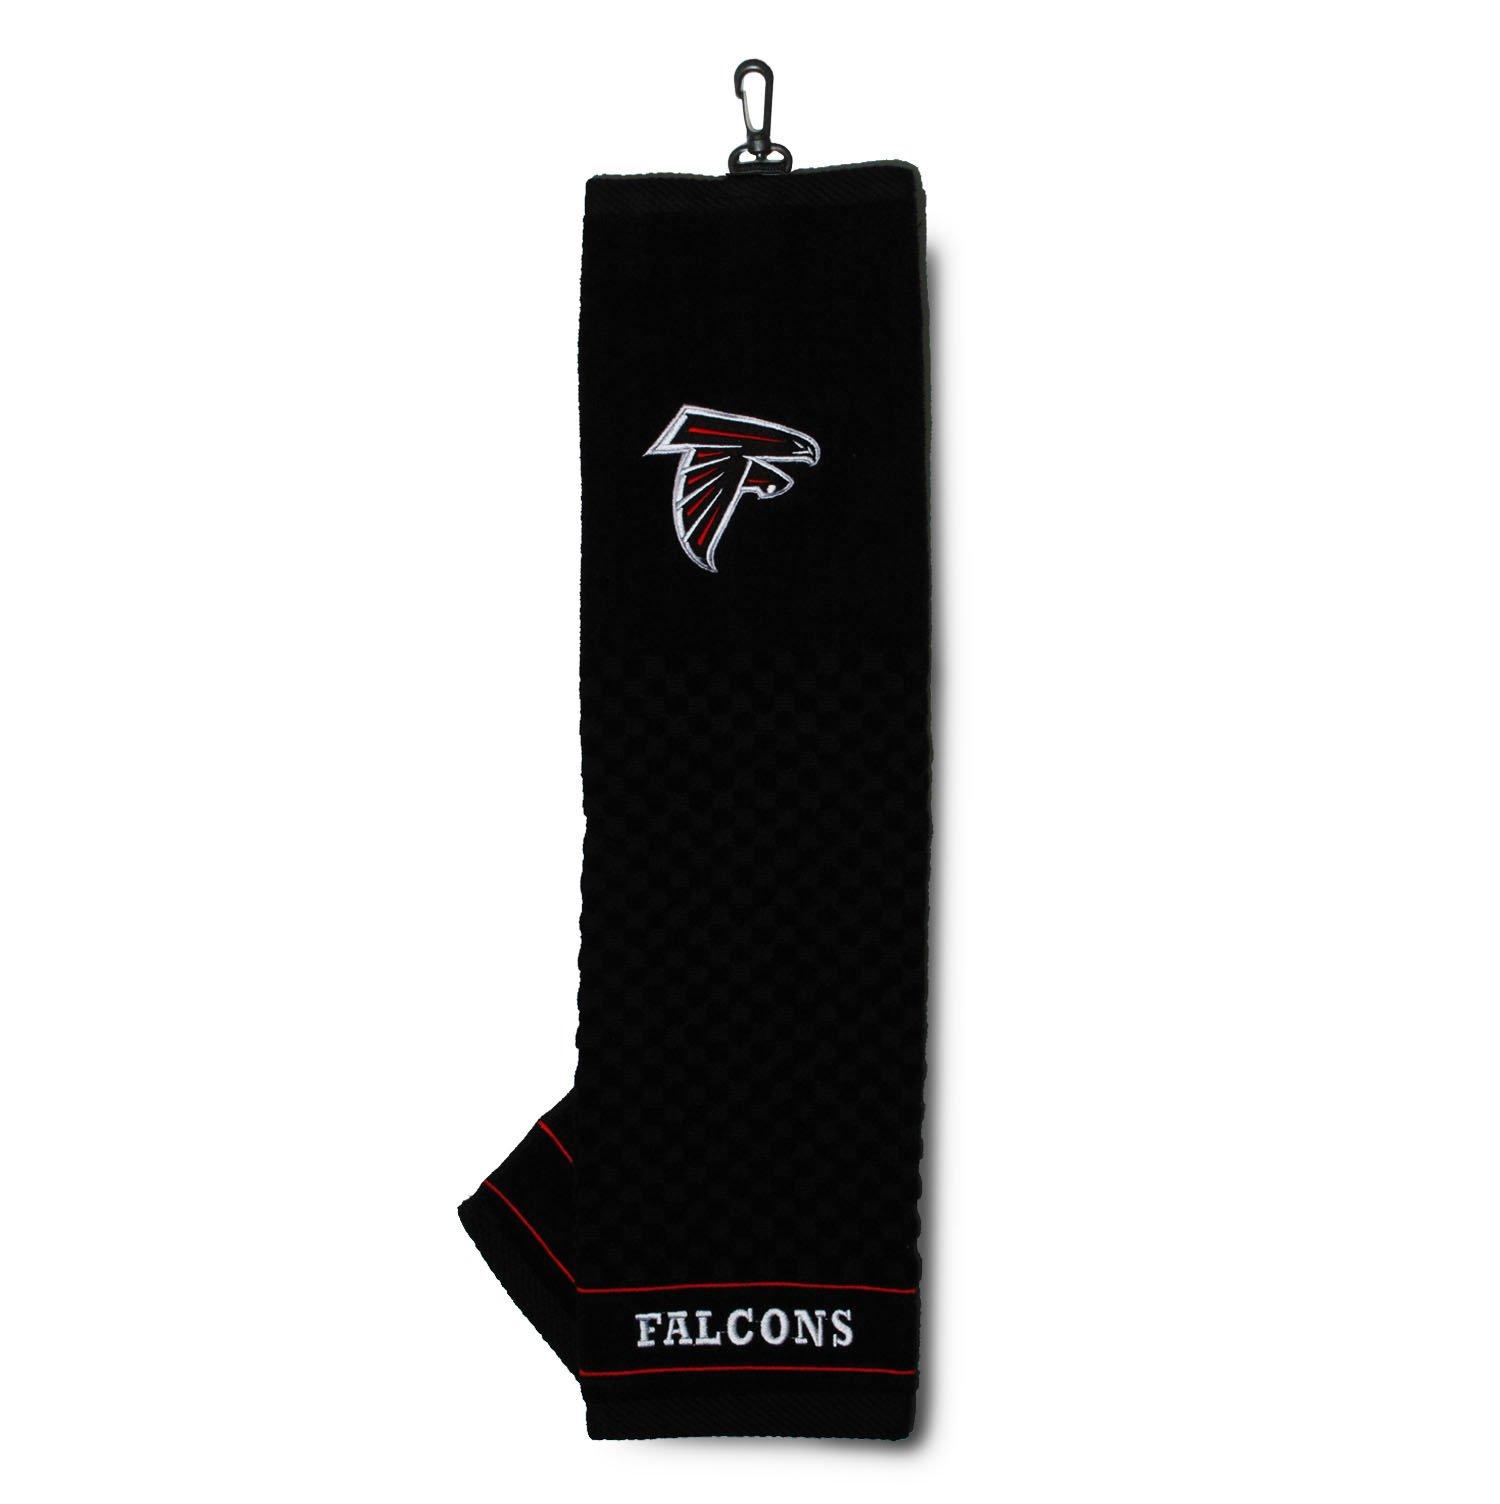 Team Golf NFL Atlanta Falcons Embroidered Golf Towel, Checkered Scrubber Design, Embroidered Logo